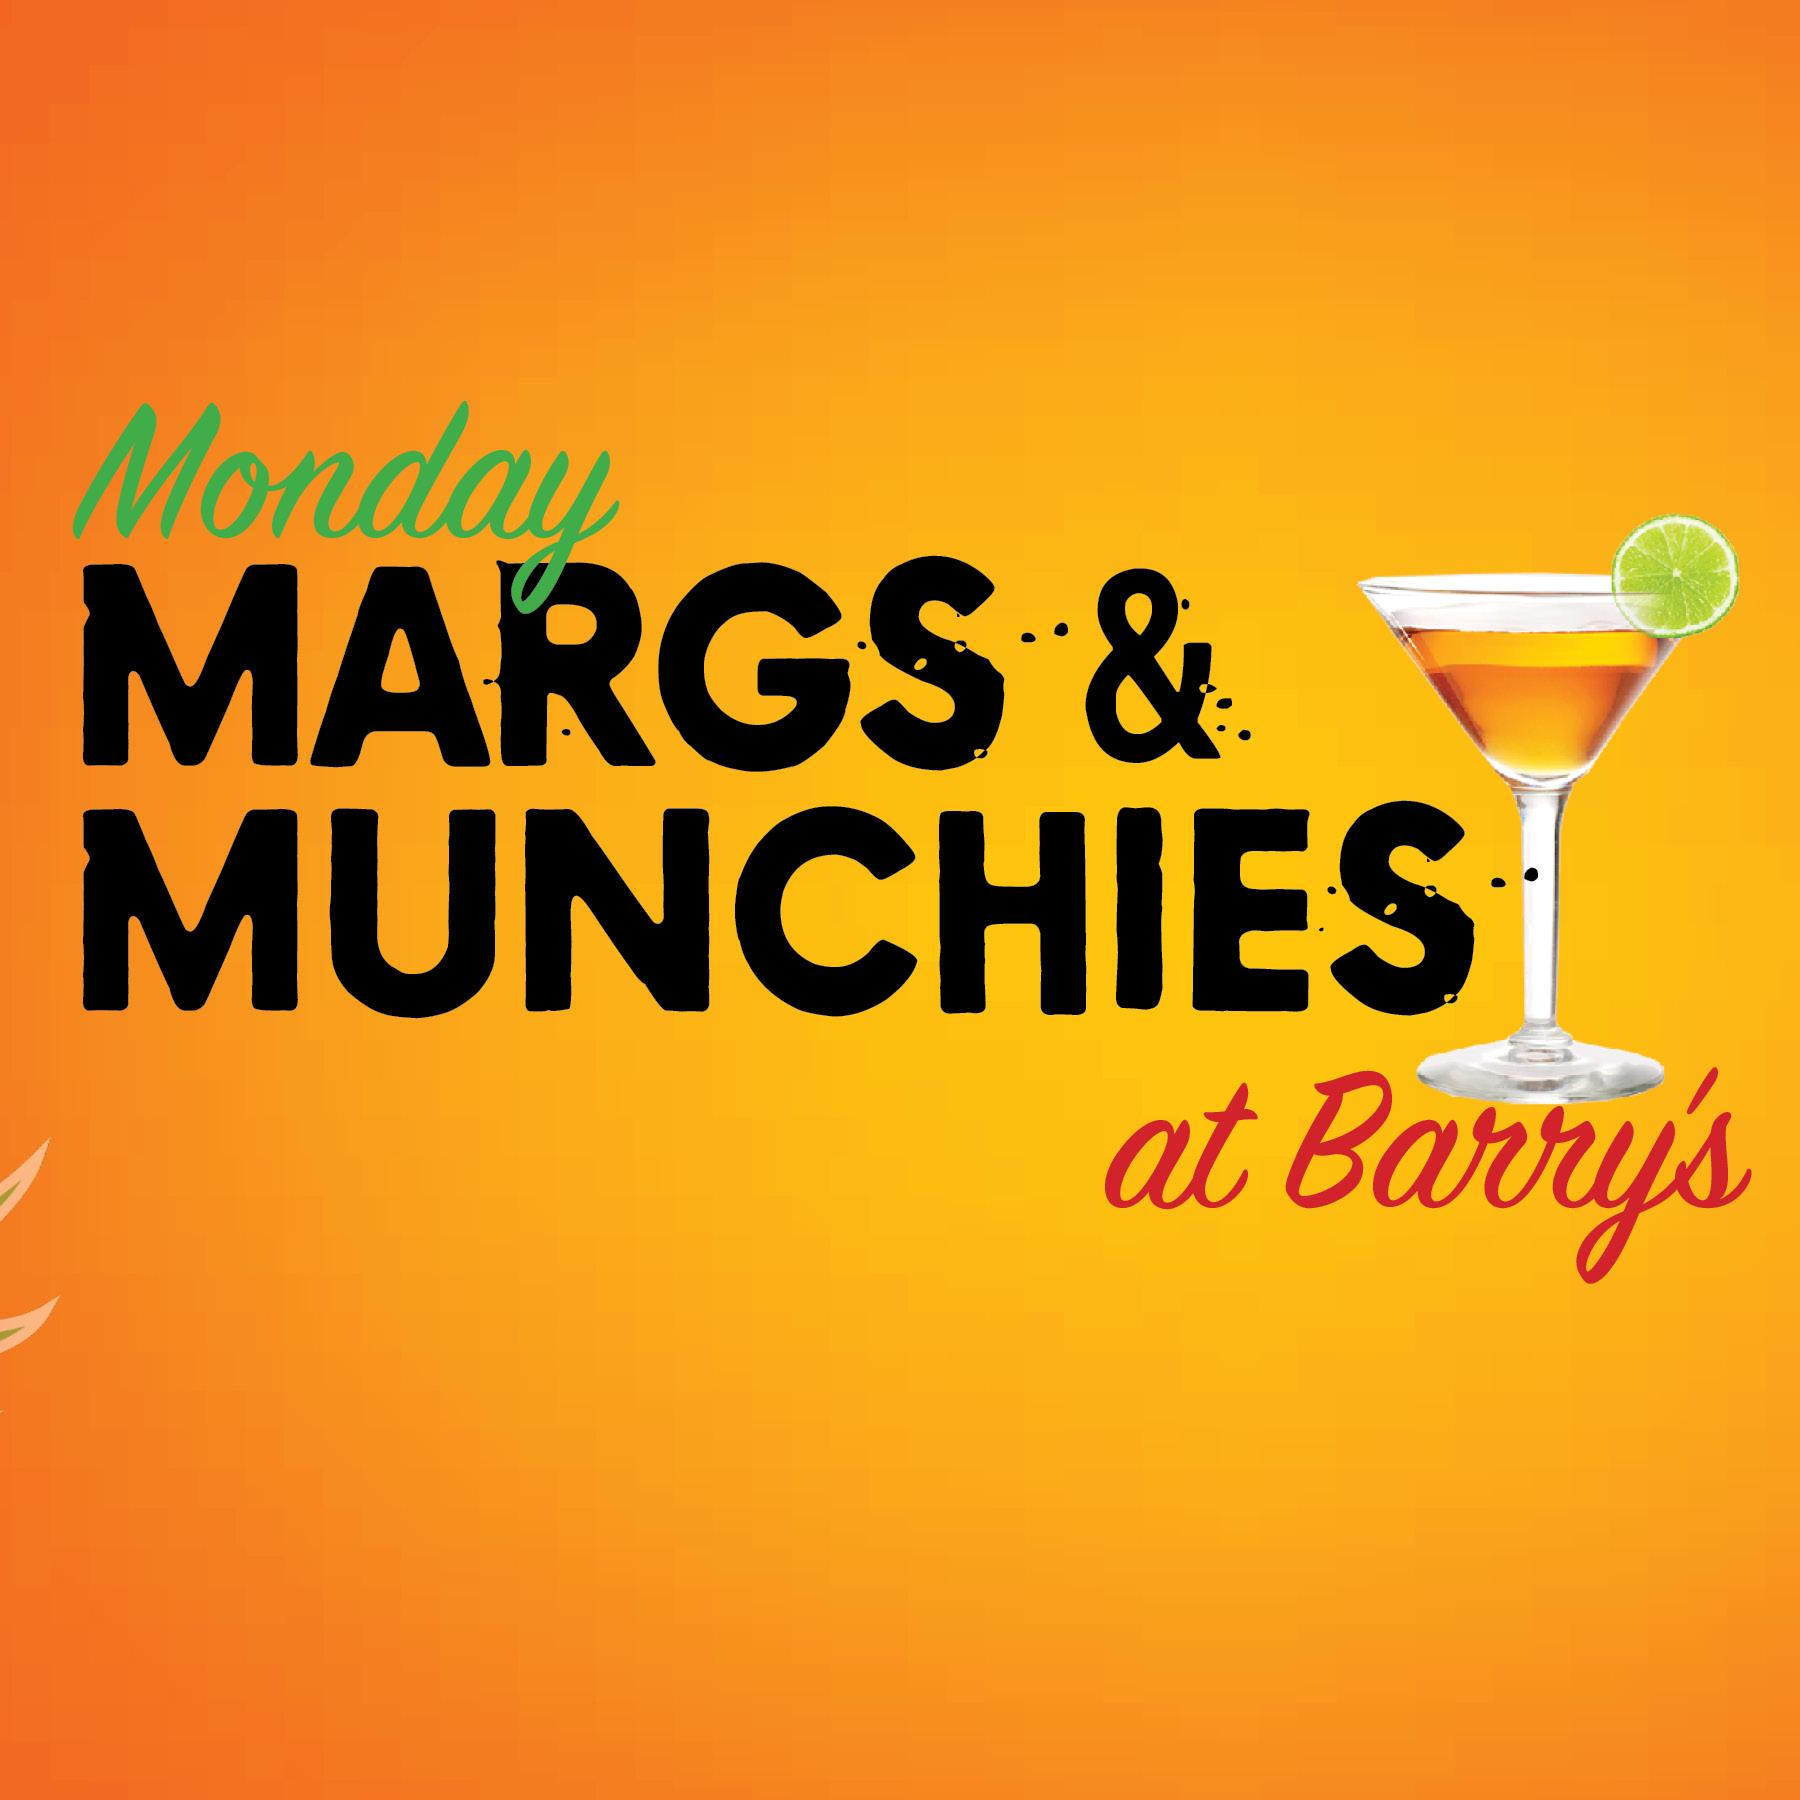 Margs and Munchies.jpg